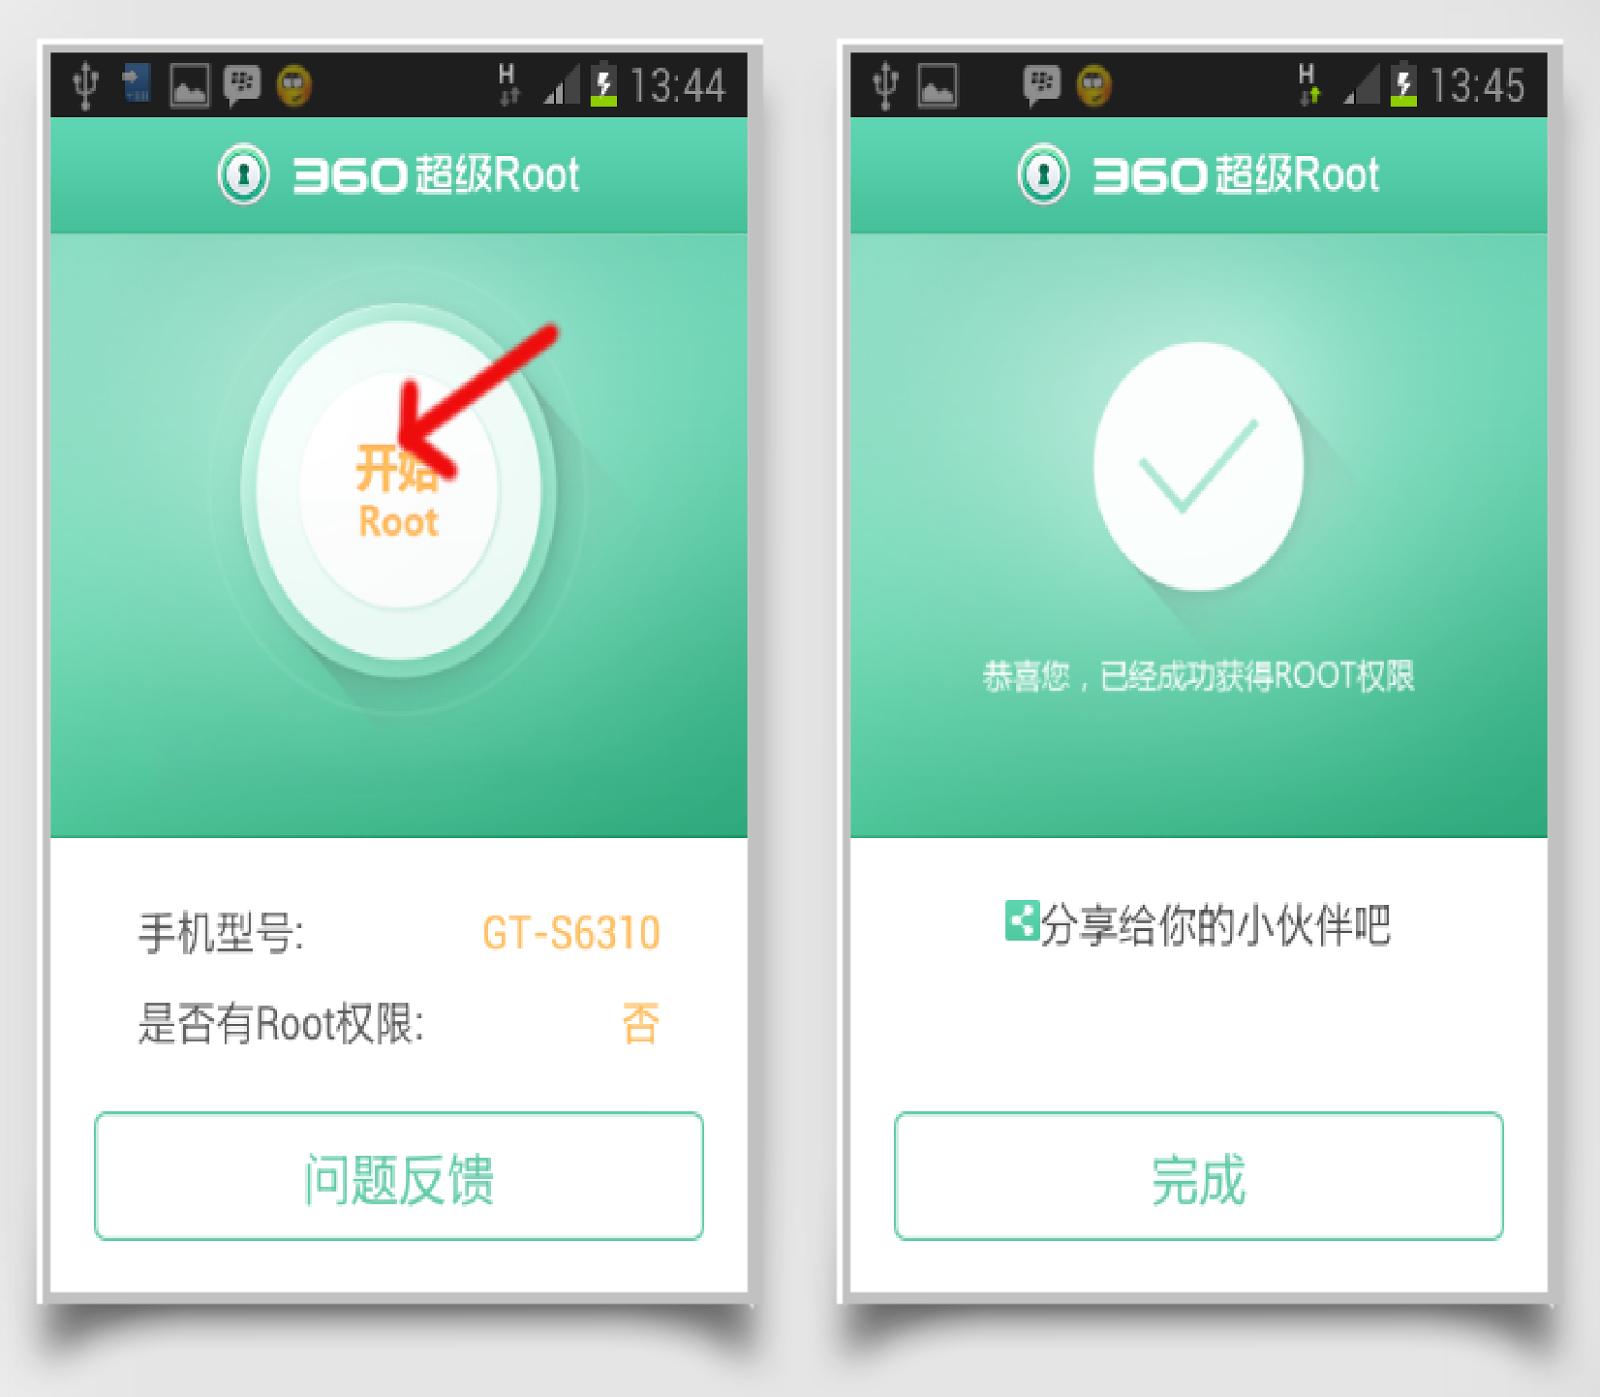 Cara Mudah Root Android Tanpa Pc Tools Aryo Go Mito A850 Jellybean Tekan Tombol Untuk Memulai Proses Tunggu Sampai Selesai